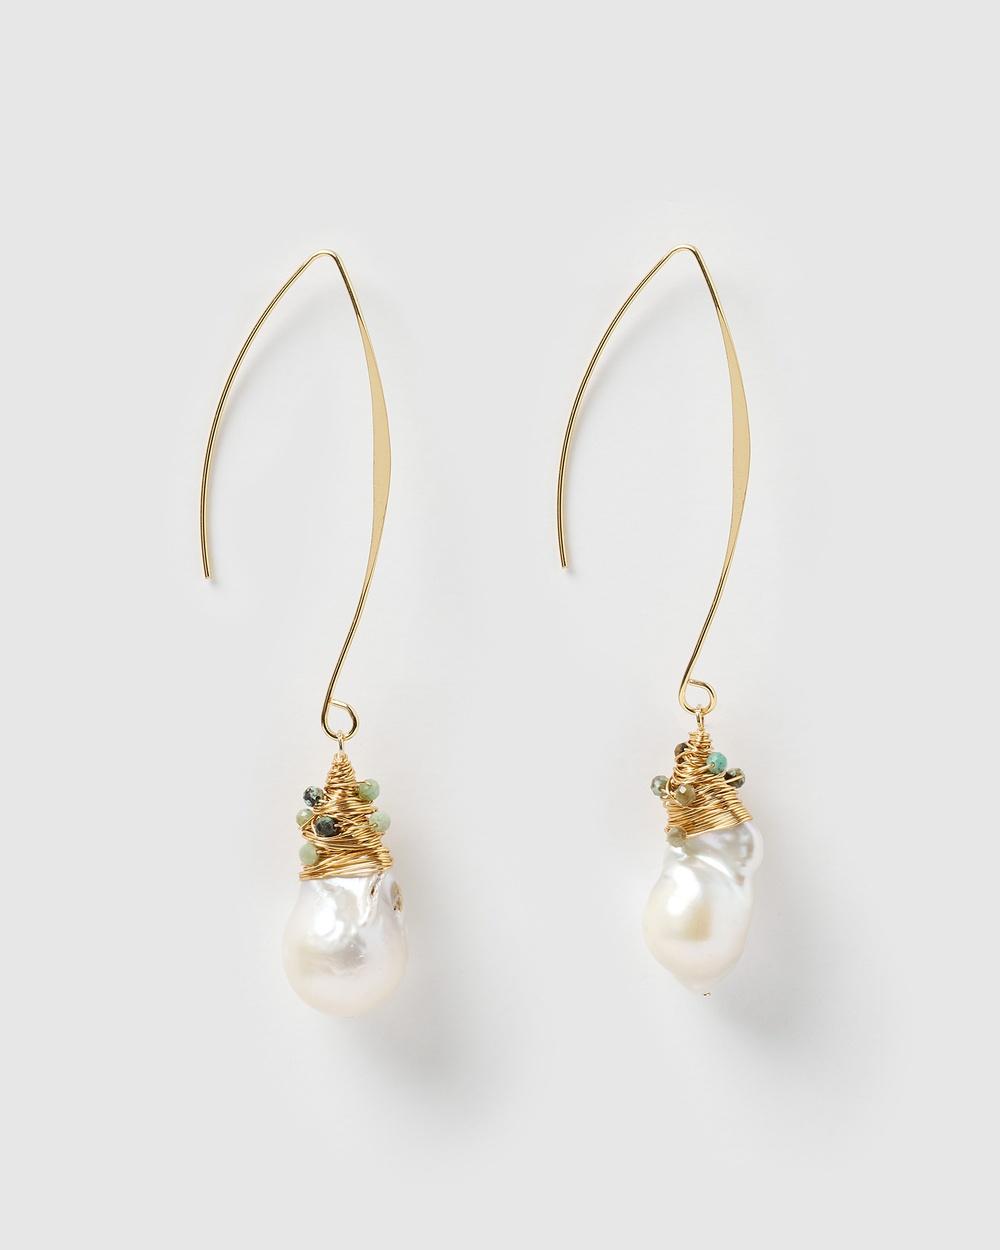 Miz Casa and Co Kelsey Drop Earrings Jewellery Freshwater Pearl Turquoise